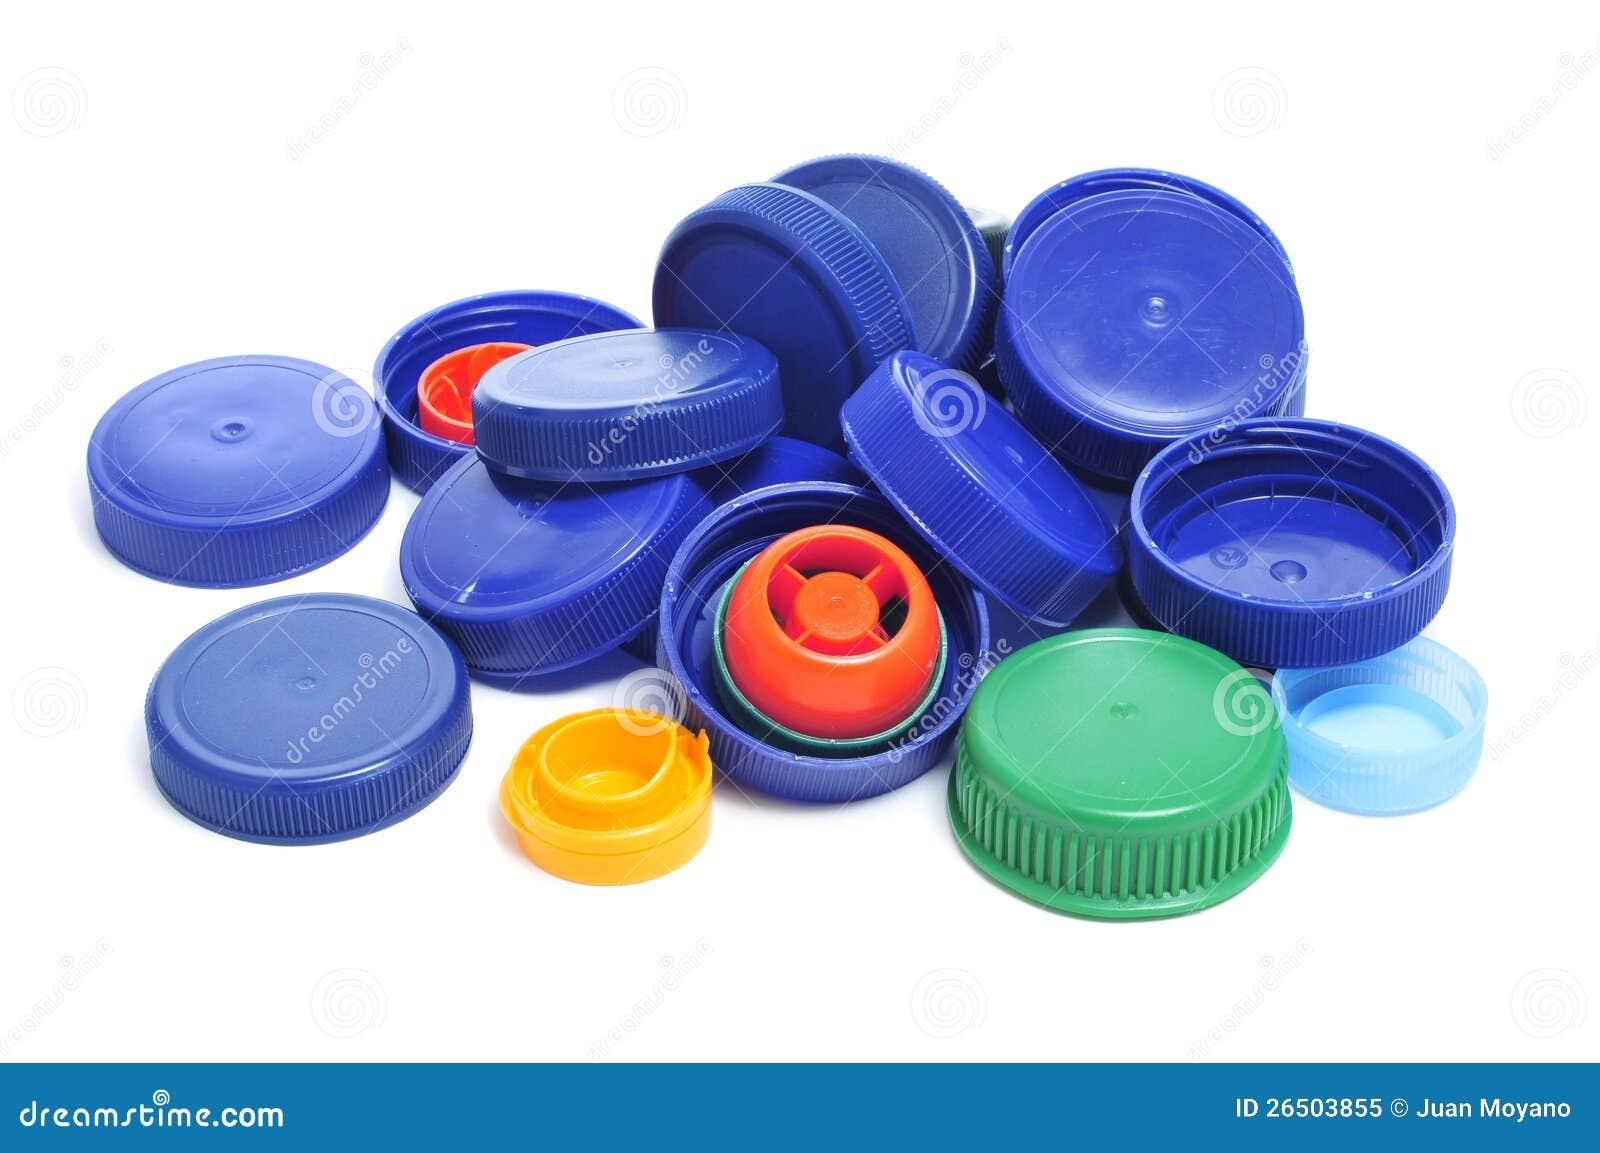 plastic caps stock image image of devices consumerism. Black Bedroom Furniture Sets. Home Design Ideas